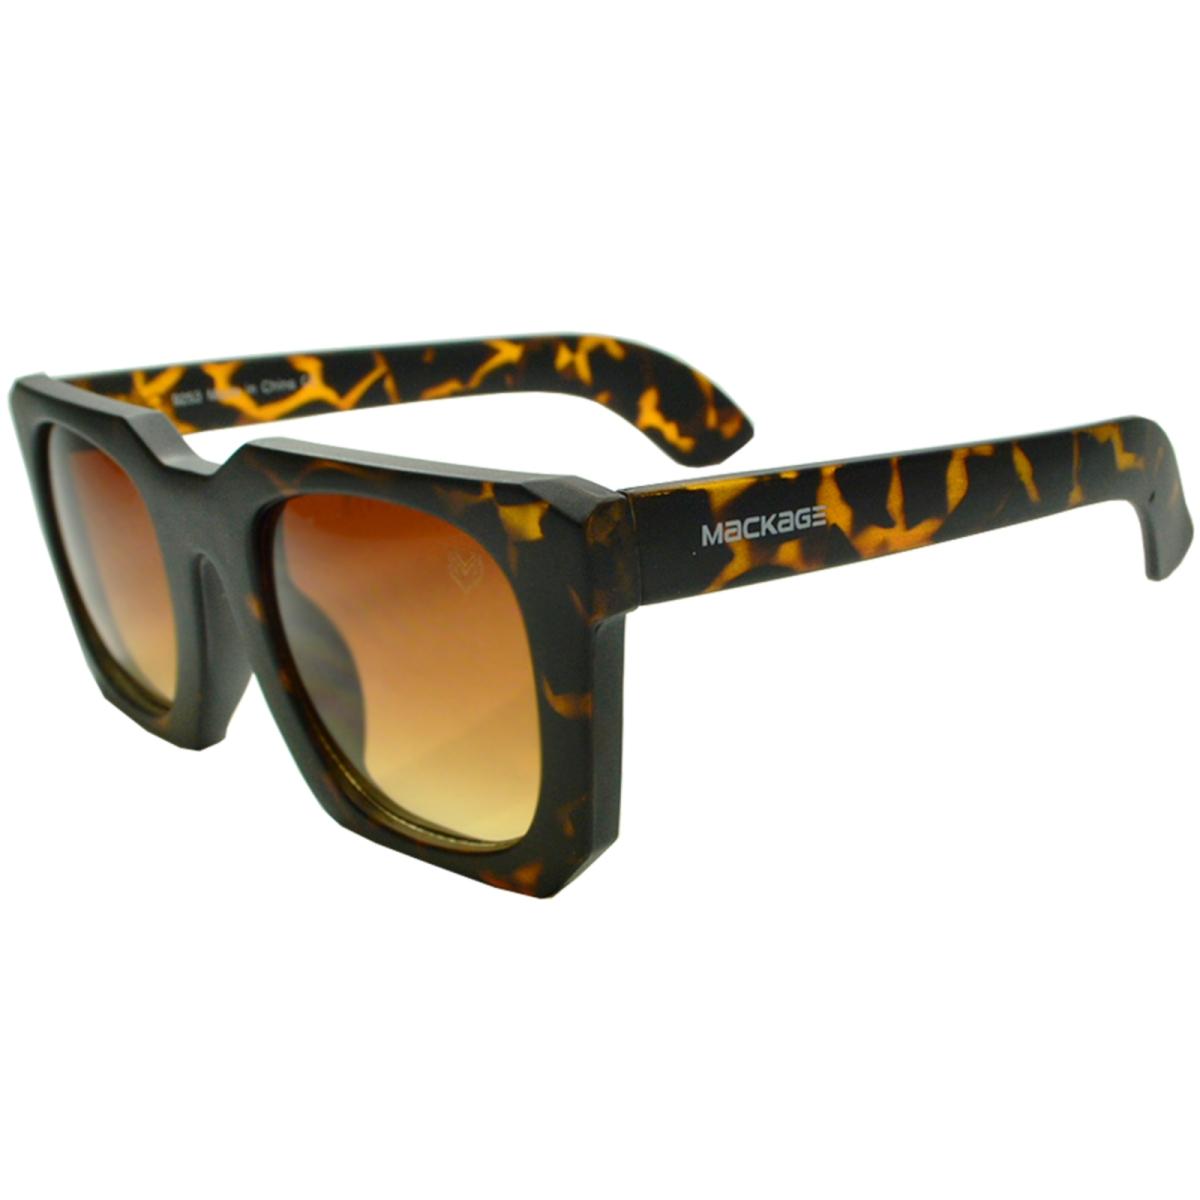 Óculos De Sol Mackage Feminino Quadrado Retrô - Tartaruga